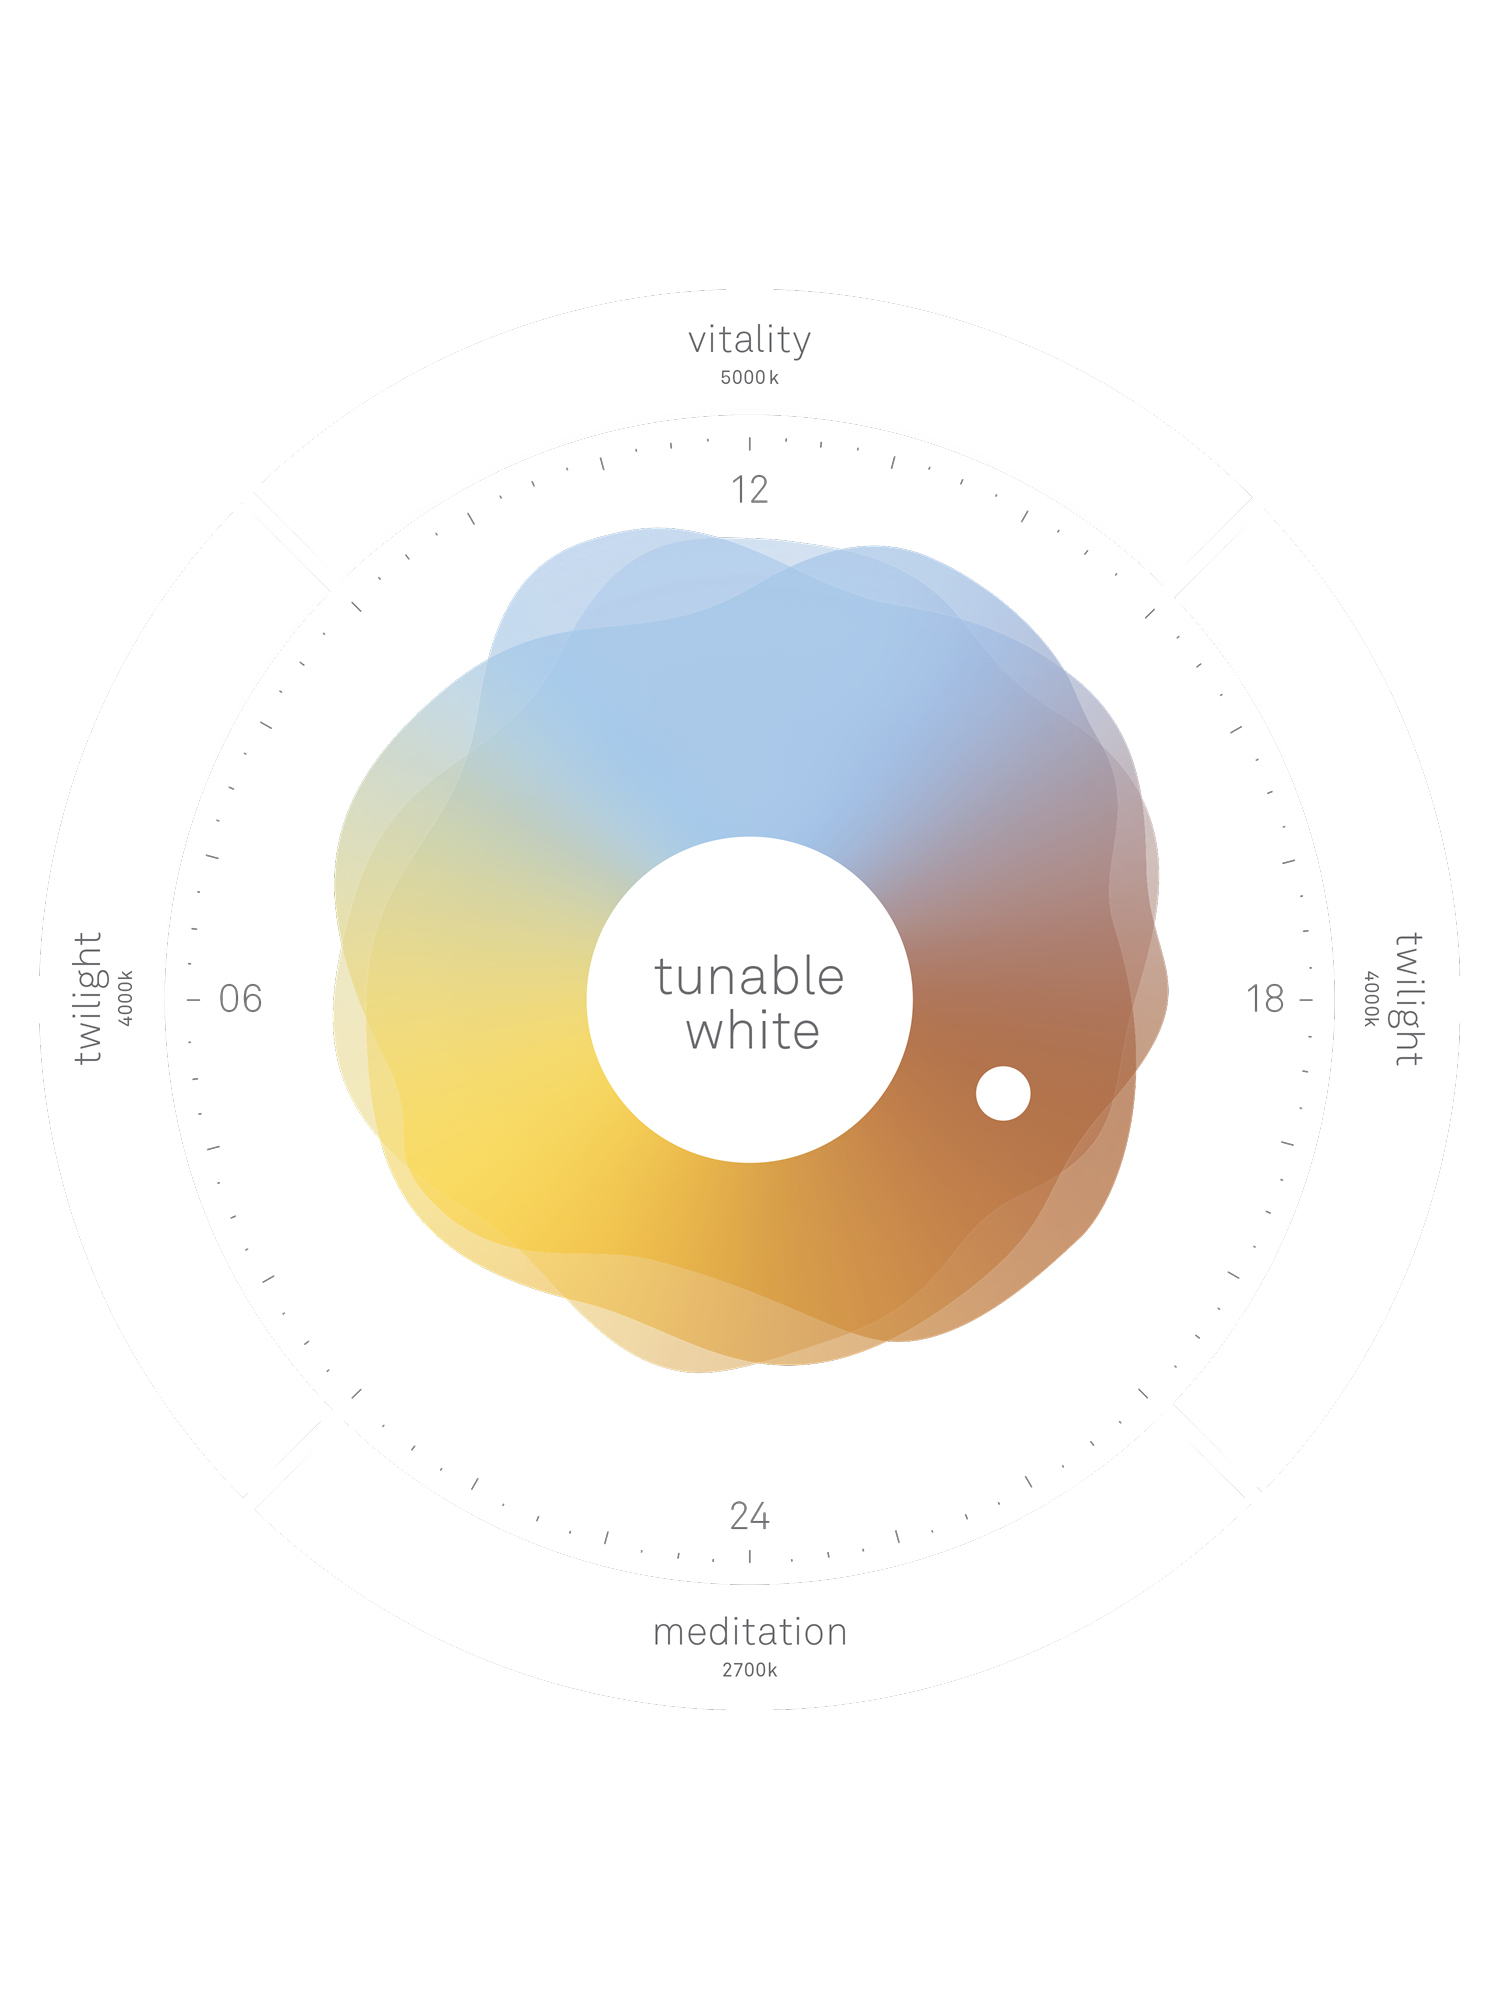 tunable white gewinnt Red Dot Award 2020!